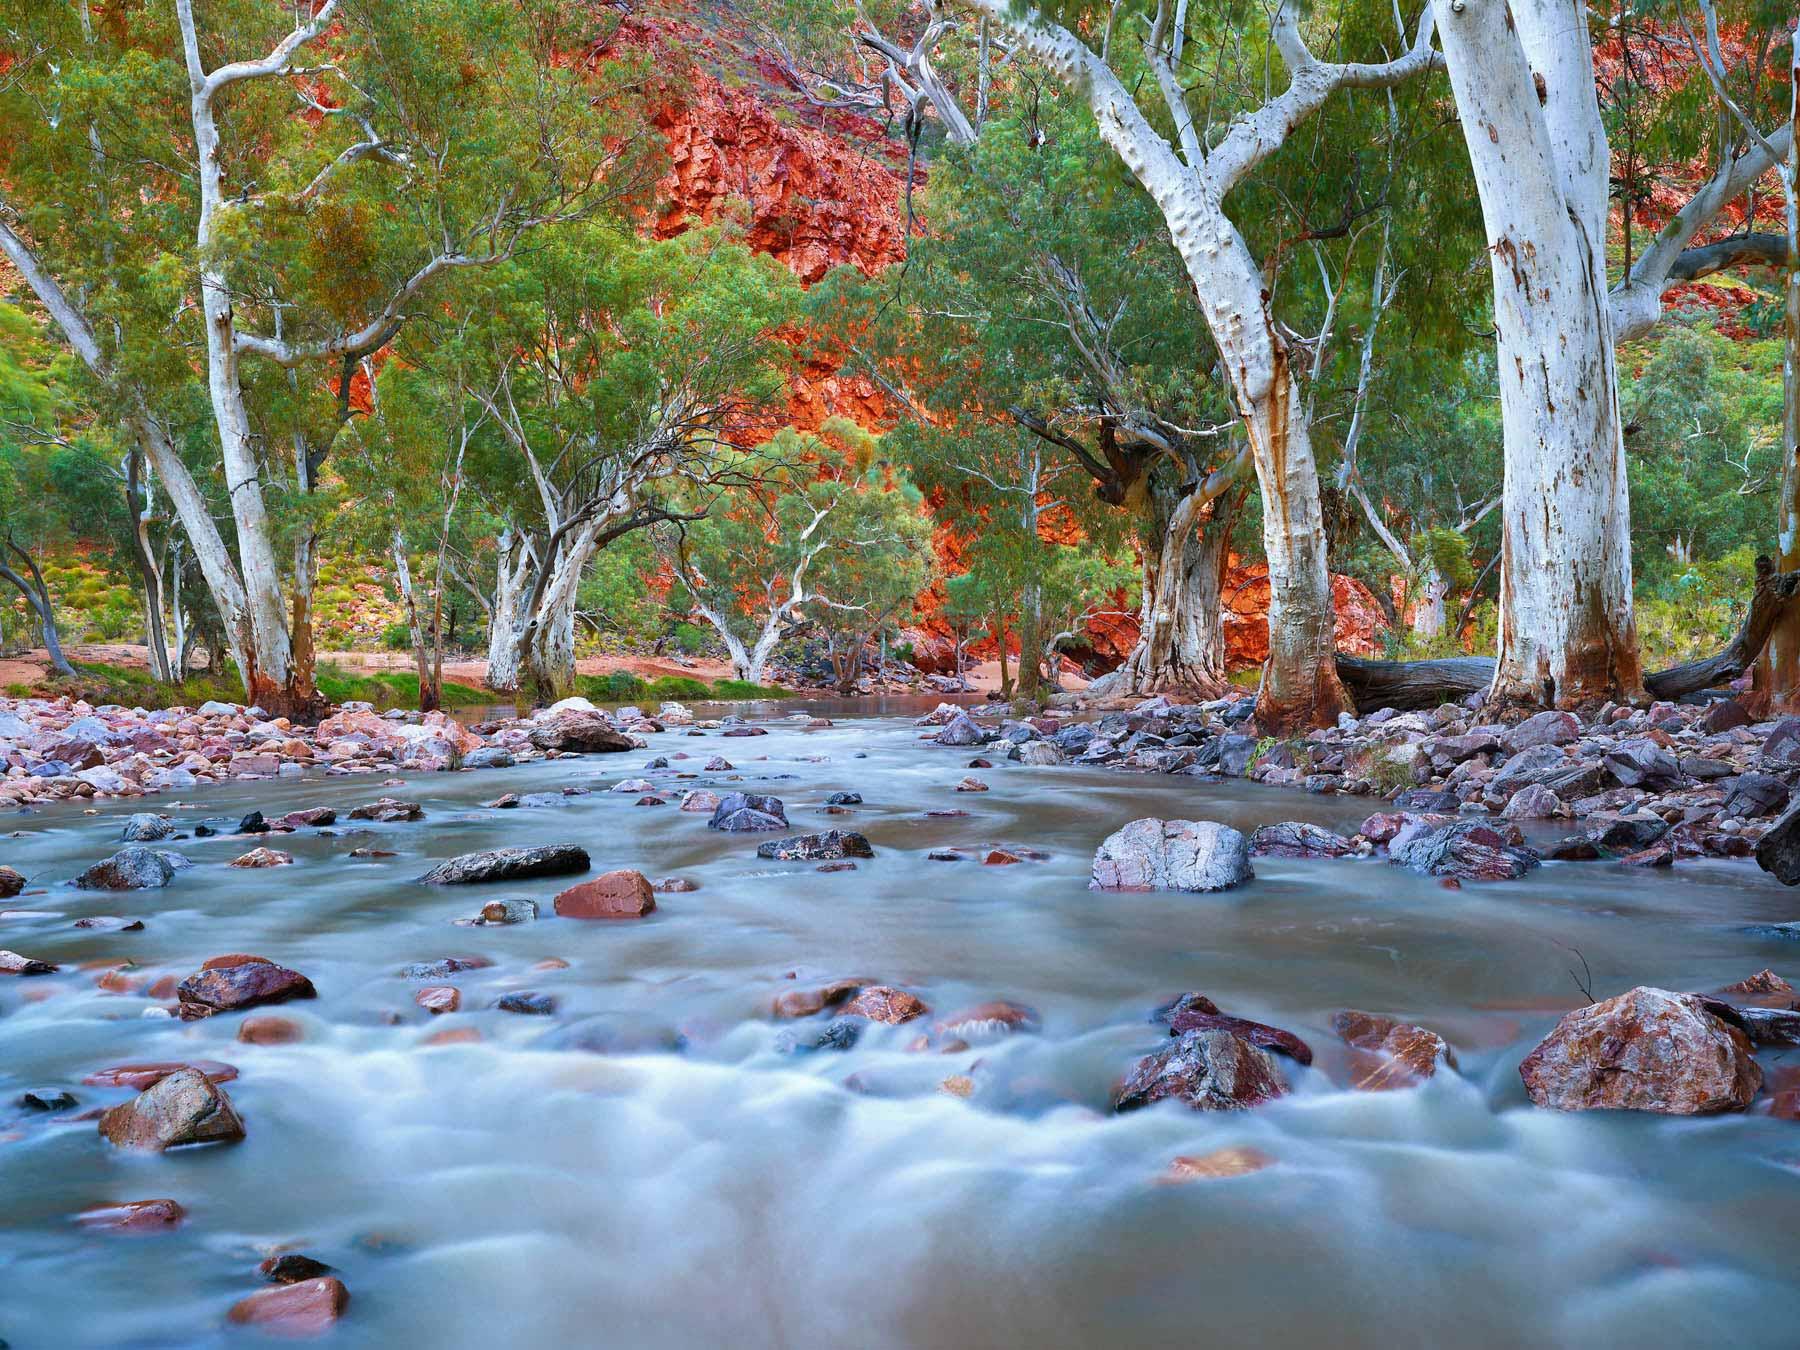 Ormiston Gorge in flood after heavy rain, Central Australia, NT.